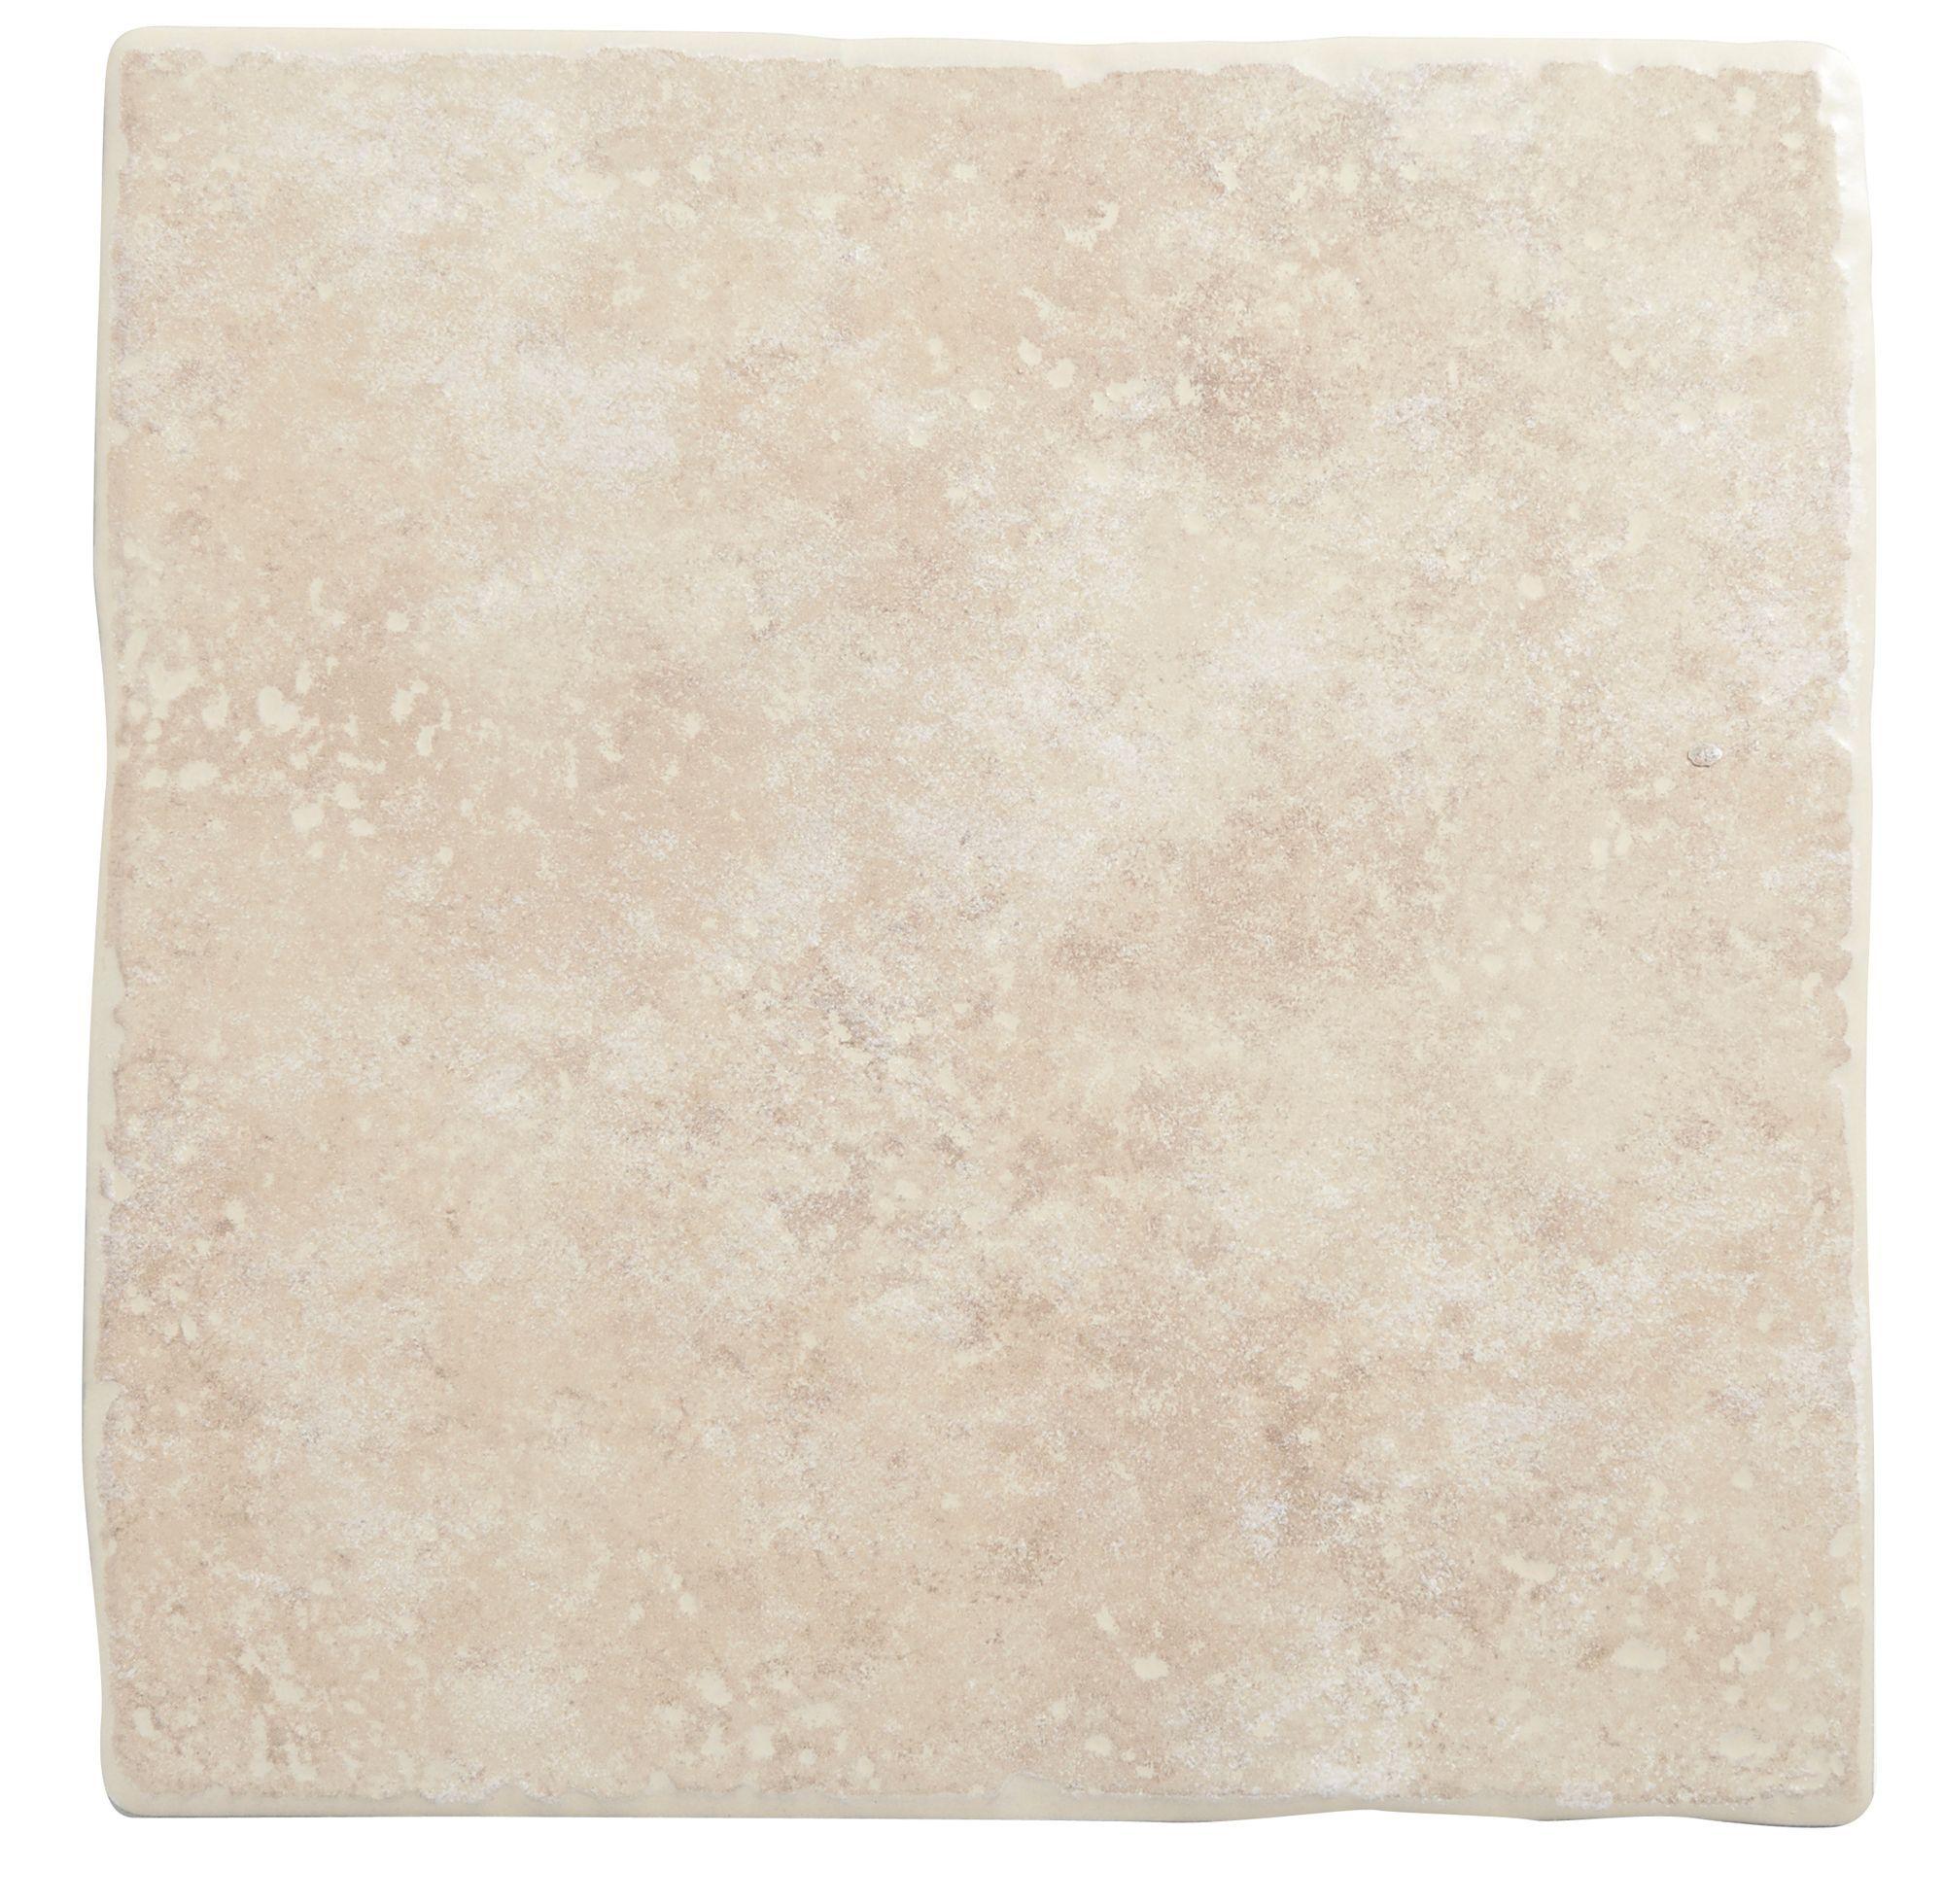 Bq Kitchen Floor Tiles Calcuta Natural Ceramic Floor Tile Pack Of 9 L330mm W330mm